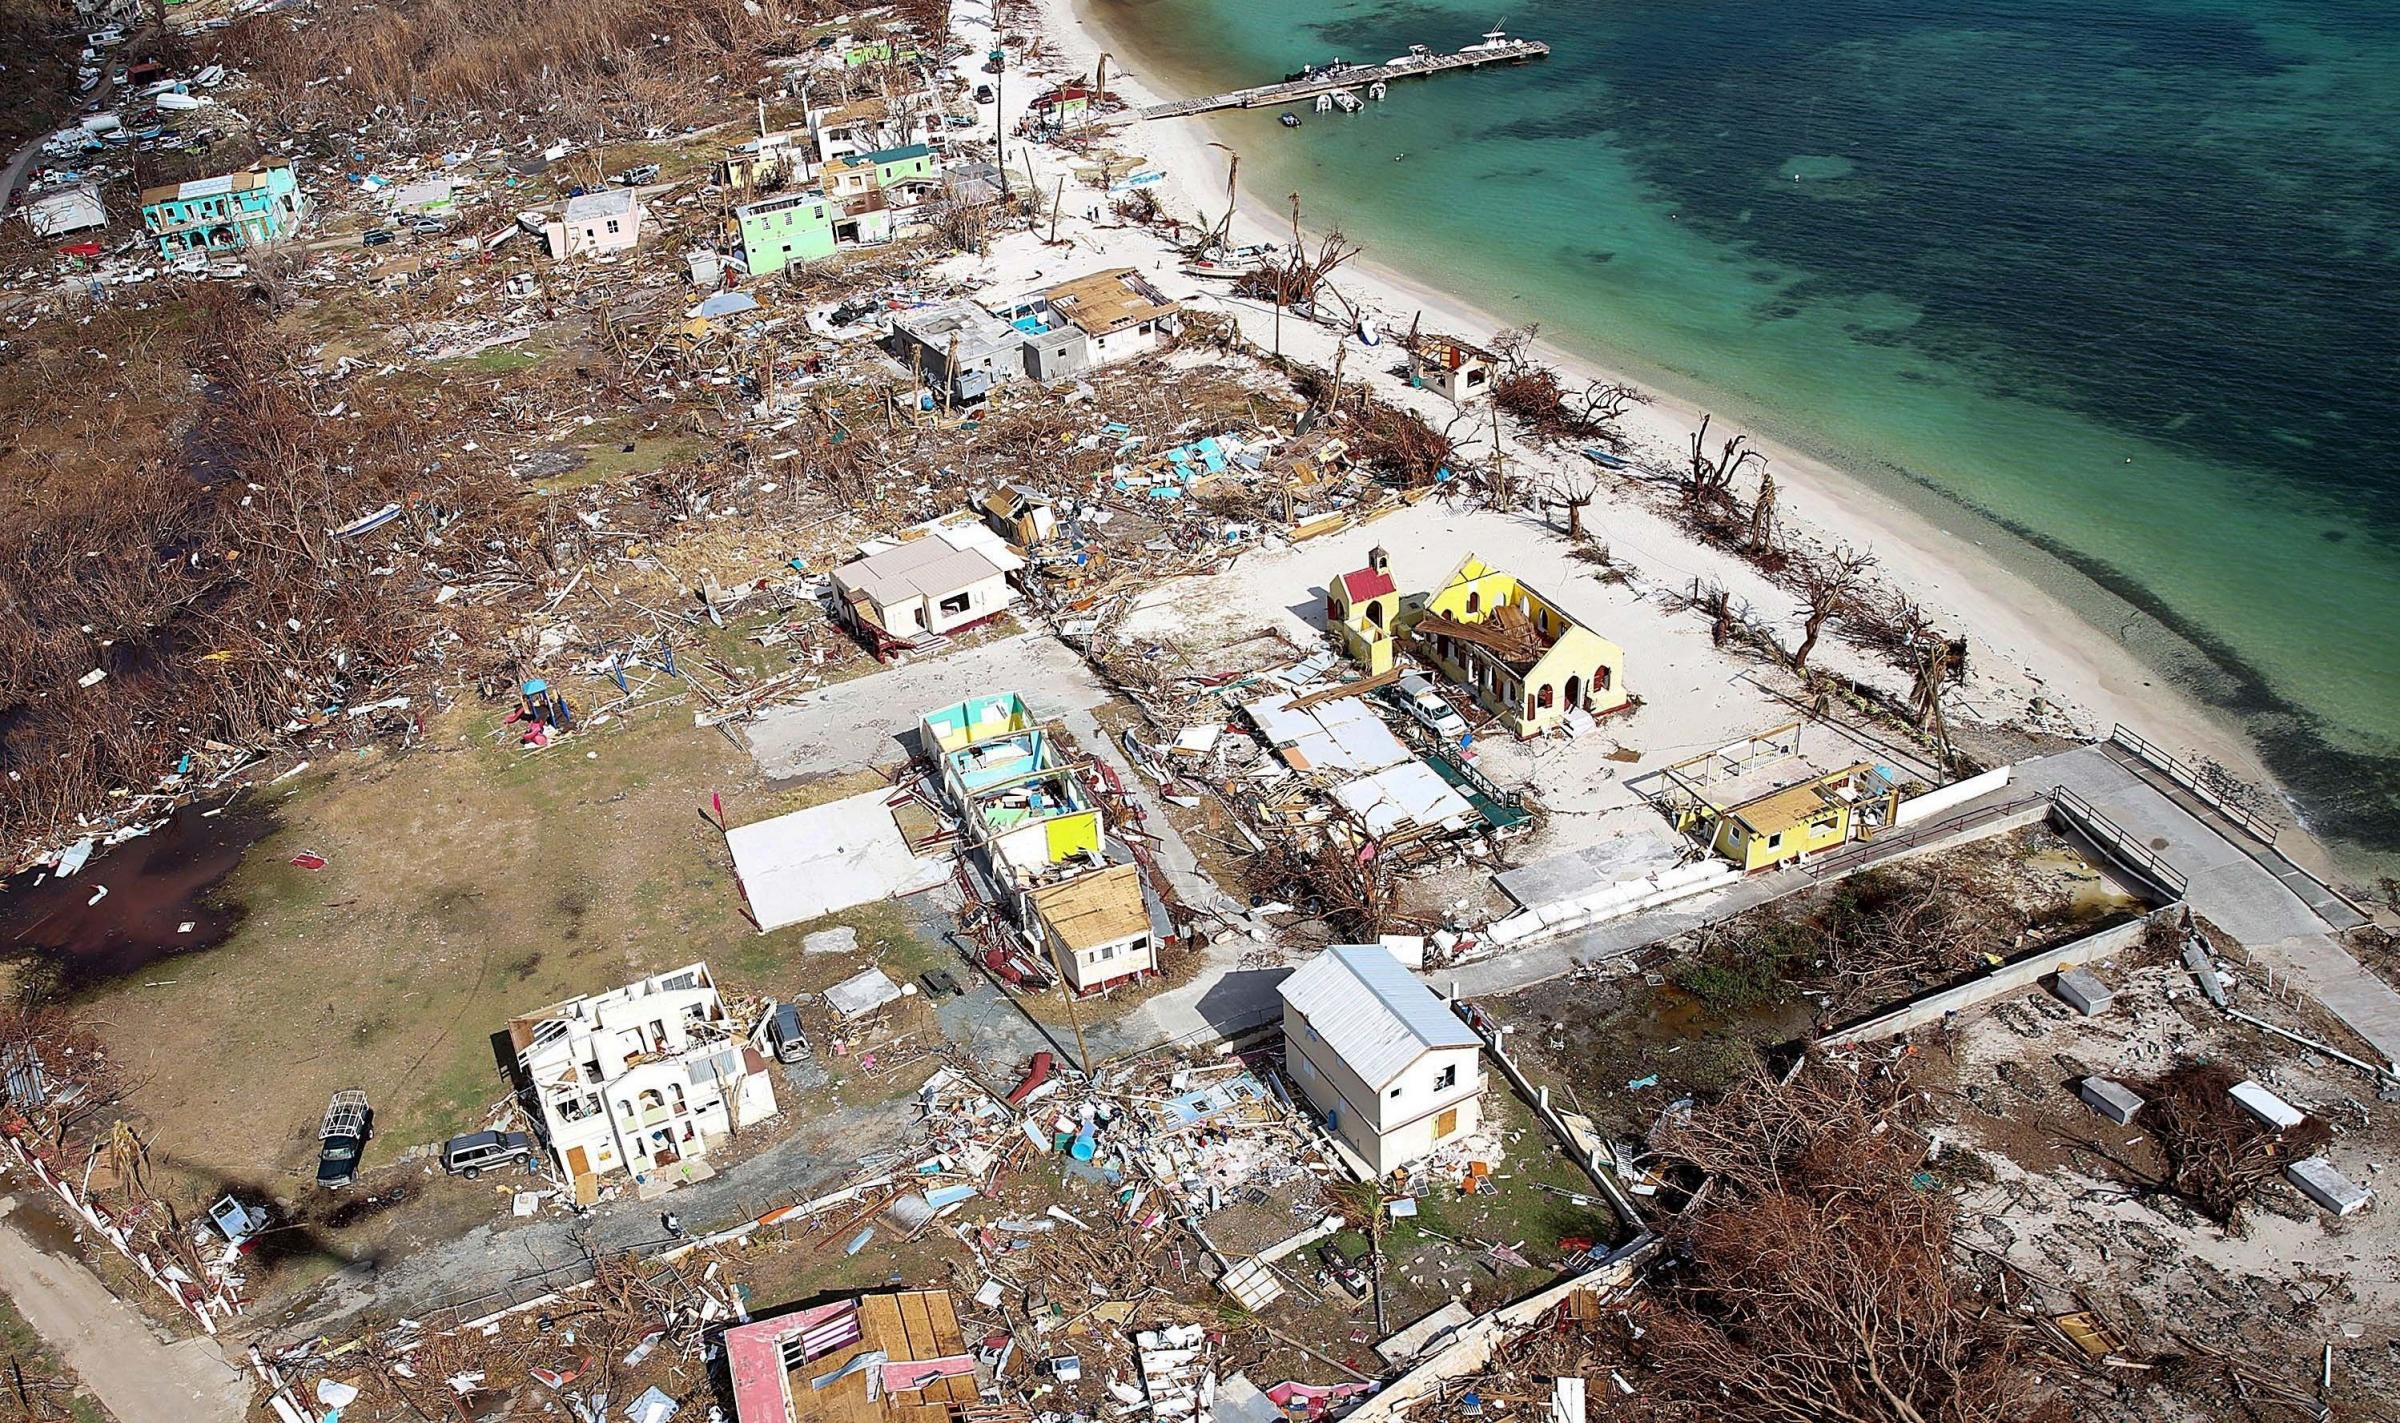 Hurricane Irma has done huge damage to the island of Jost Van Dyke in the British Virgin Isles